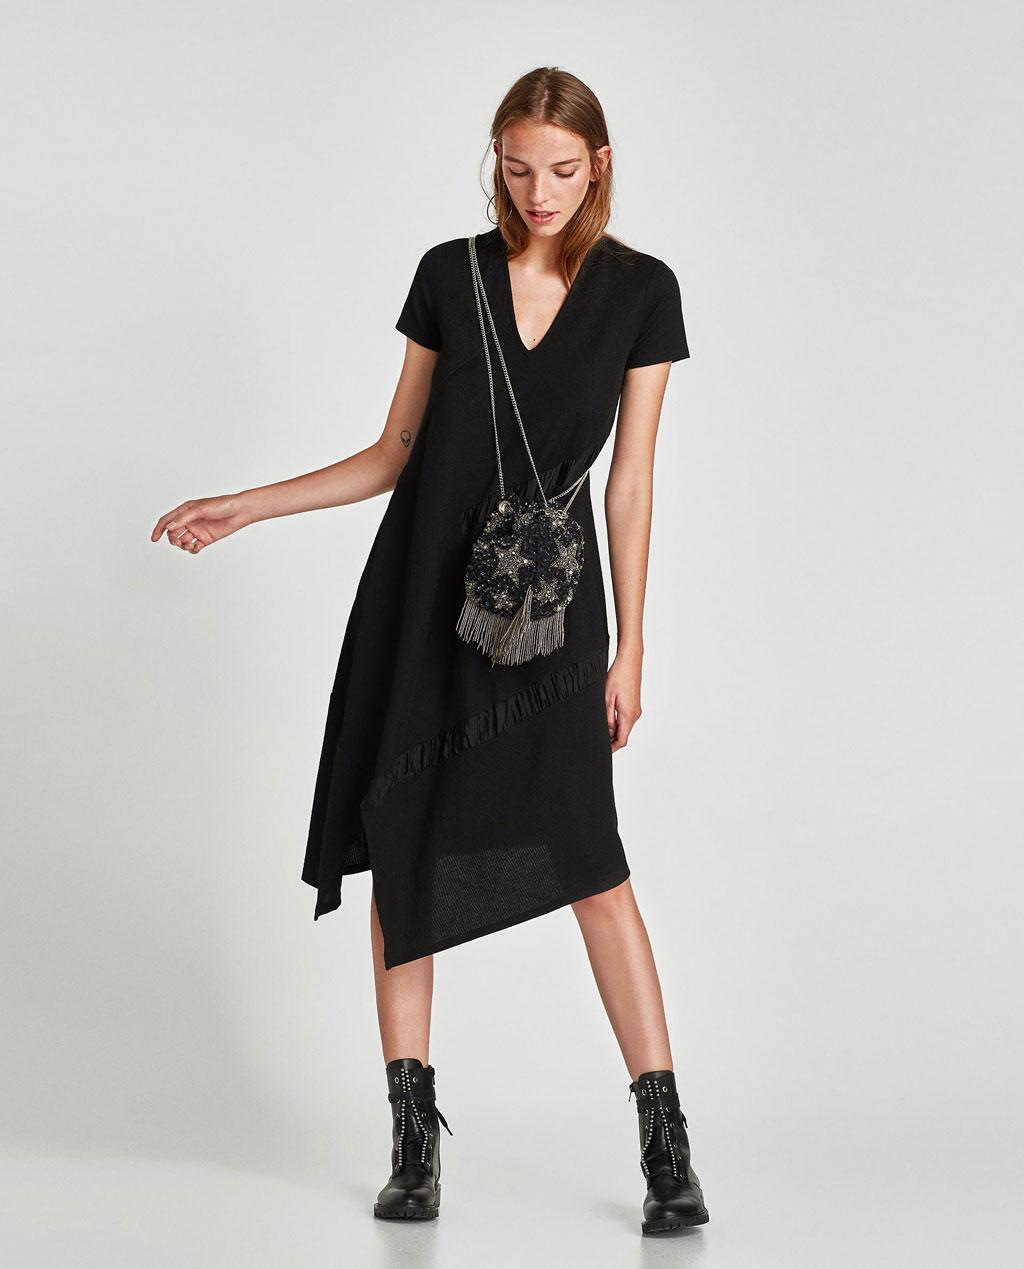 Zara Cross Body Beaded Bucket Bag Frilly Pretty Things